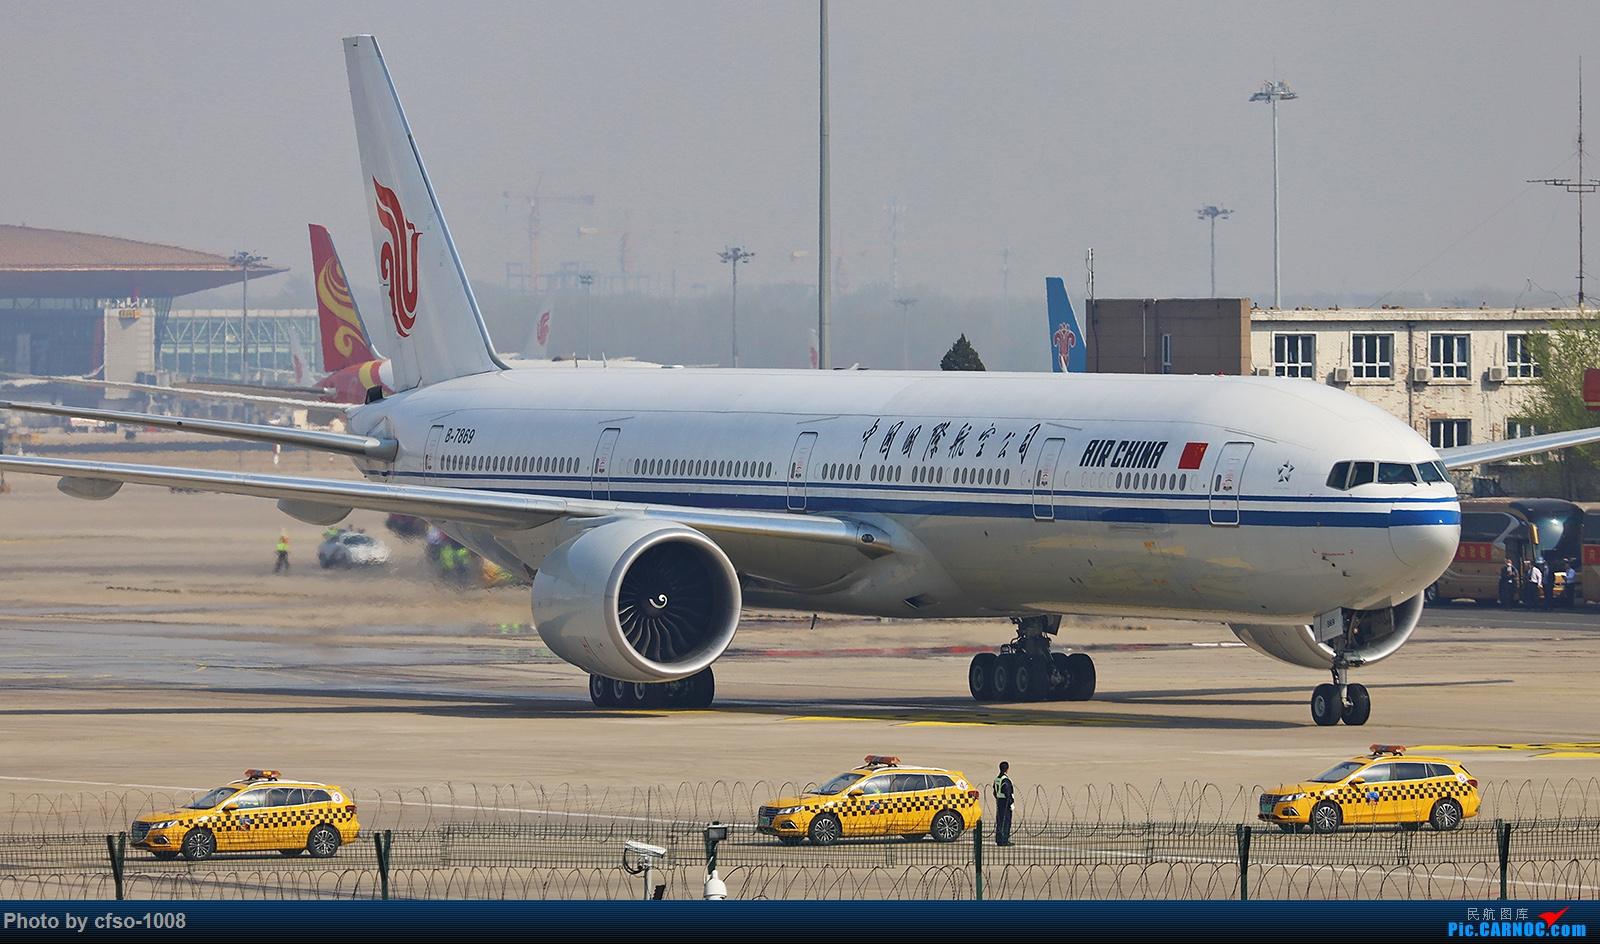 Re:[原创]迎接援鄂战士乘坐的77W载誉凯旋 BOEING 777-300ER B-7869 中国北京首都国际机场